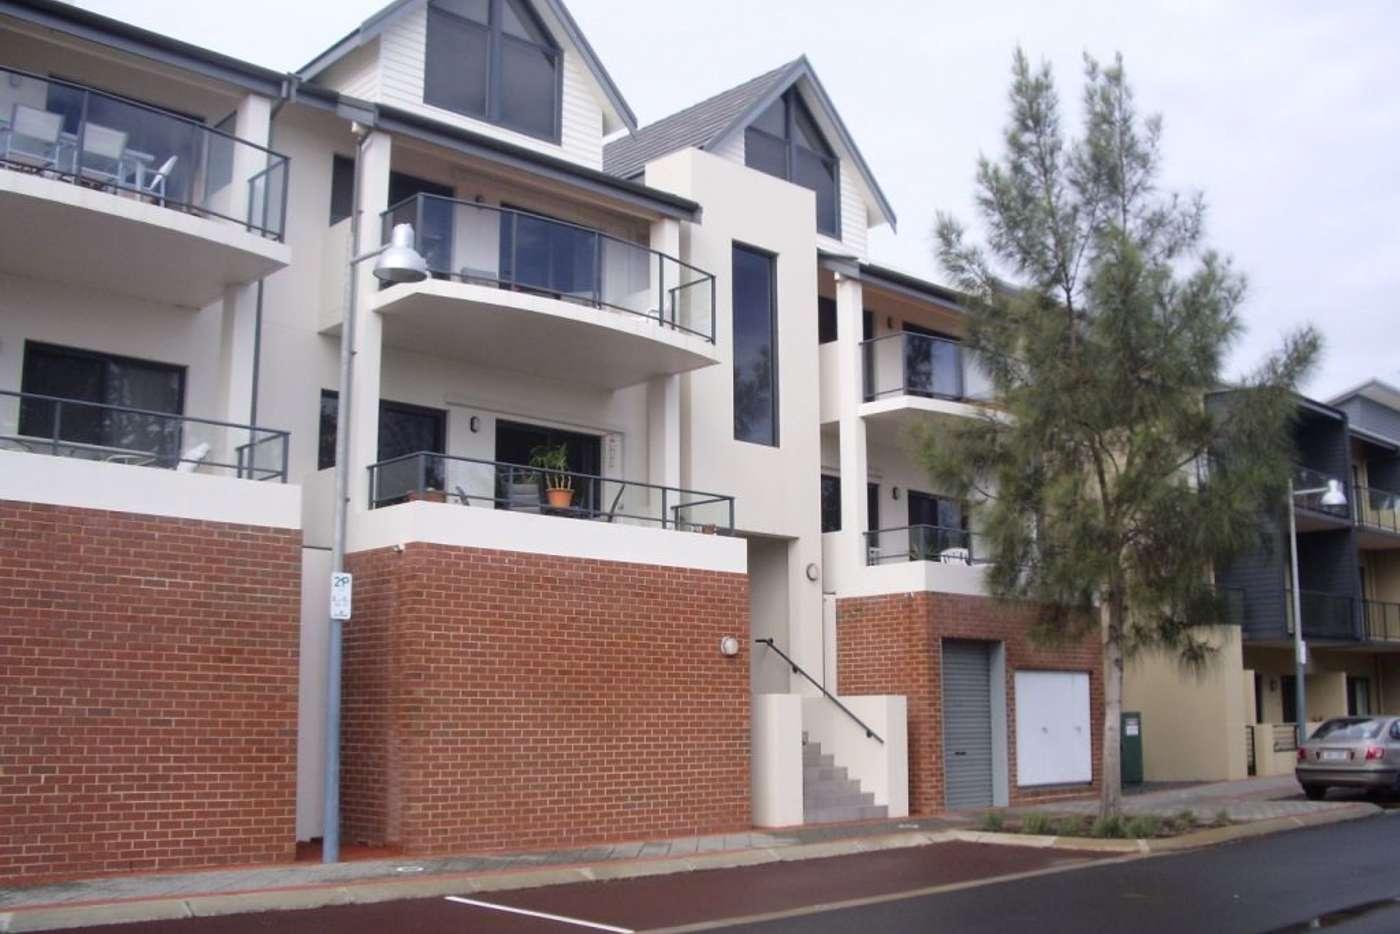 Main view of Homely unit listing, 44 Marlston Quay Apartments, Bunbury WA 6230